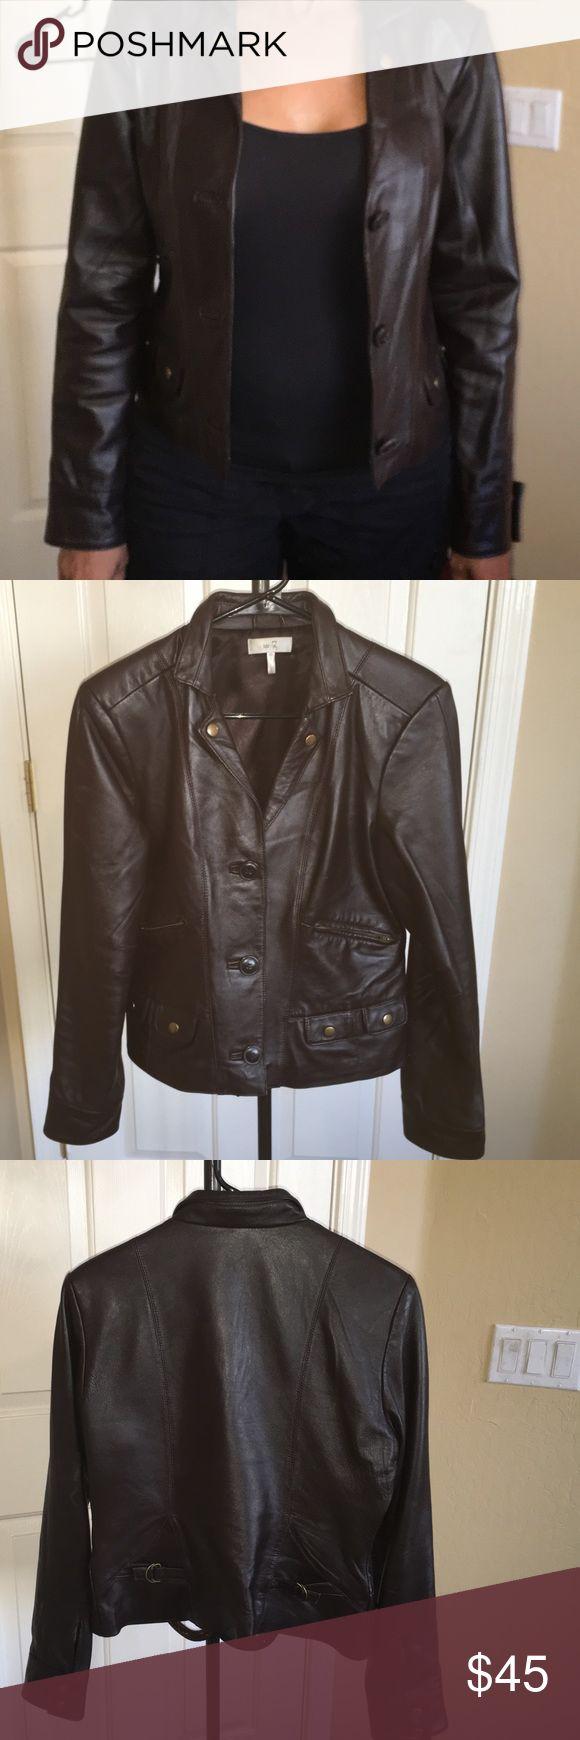 Women's brown real leather jacket Metro 7 dark brown real leather jacket in really good condition, size 6. Metro 7 Jackets & Coats Blazers